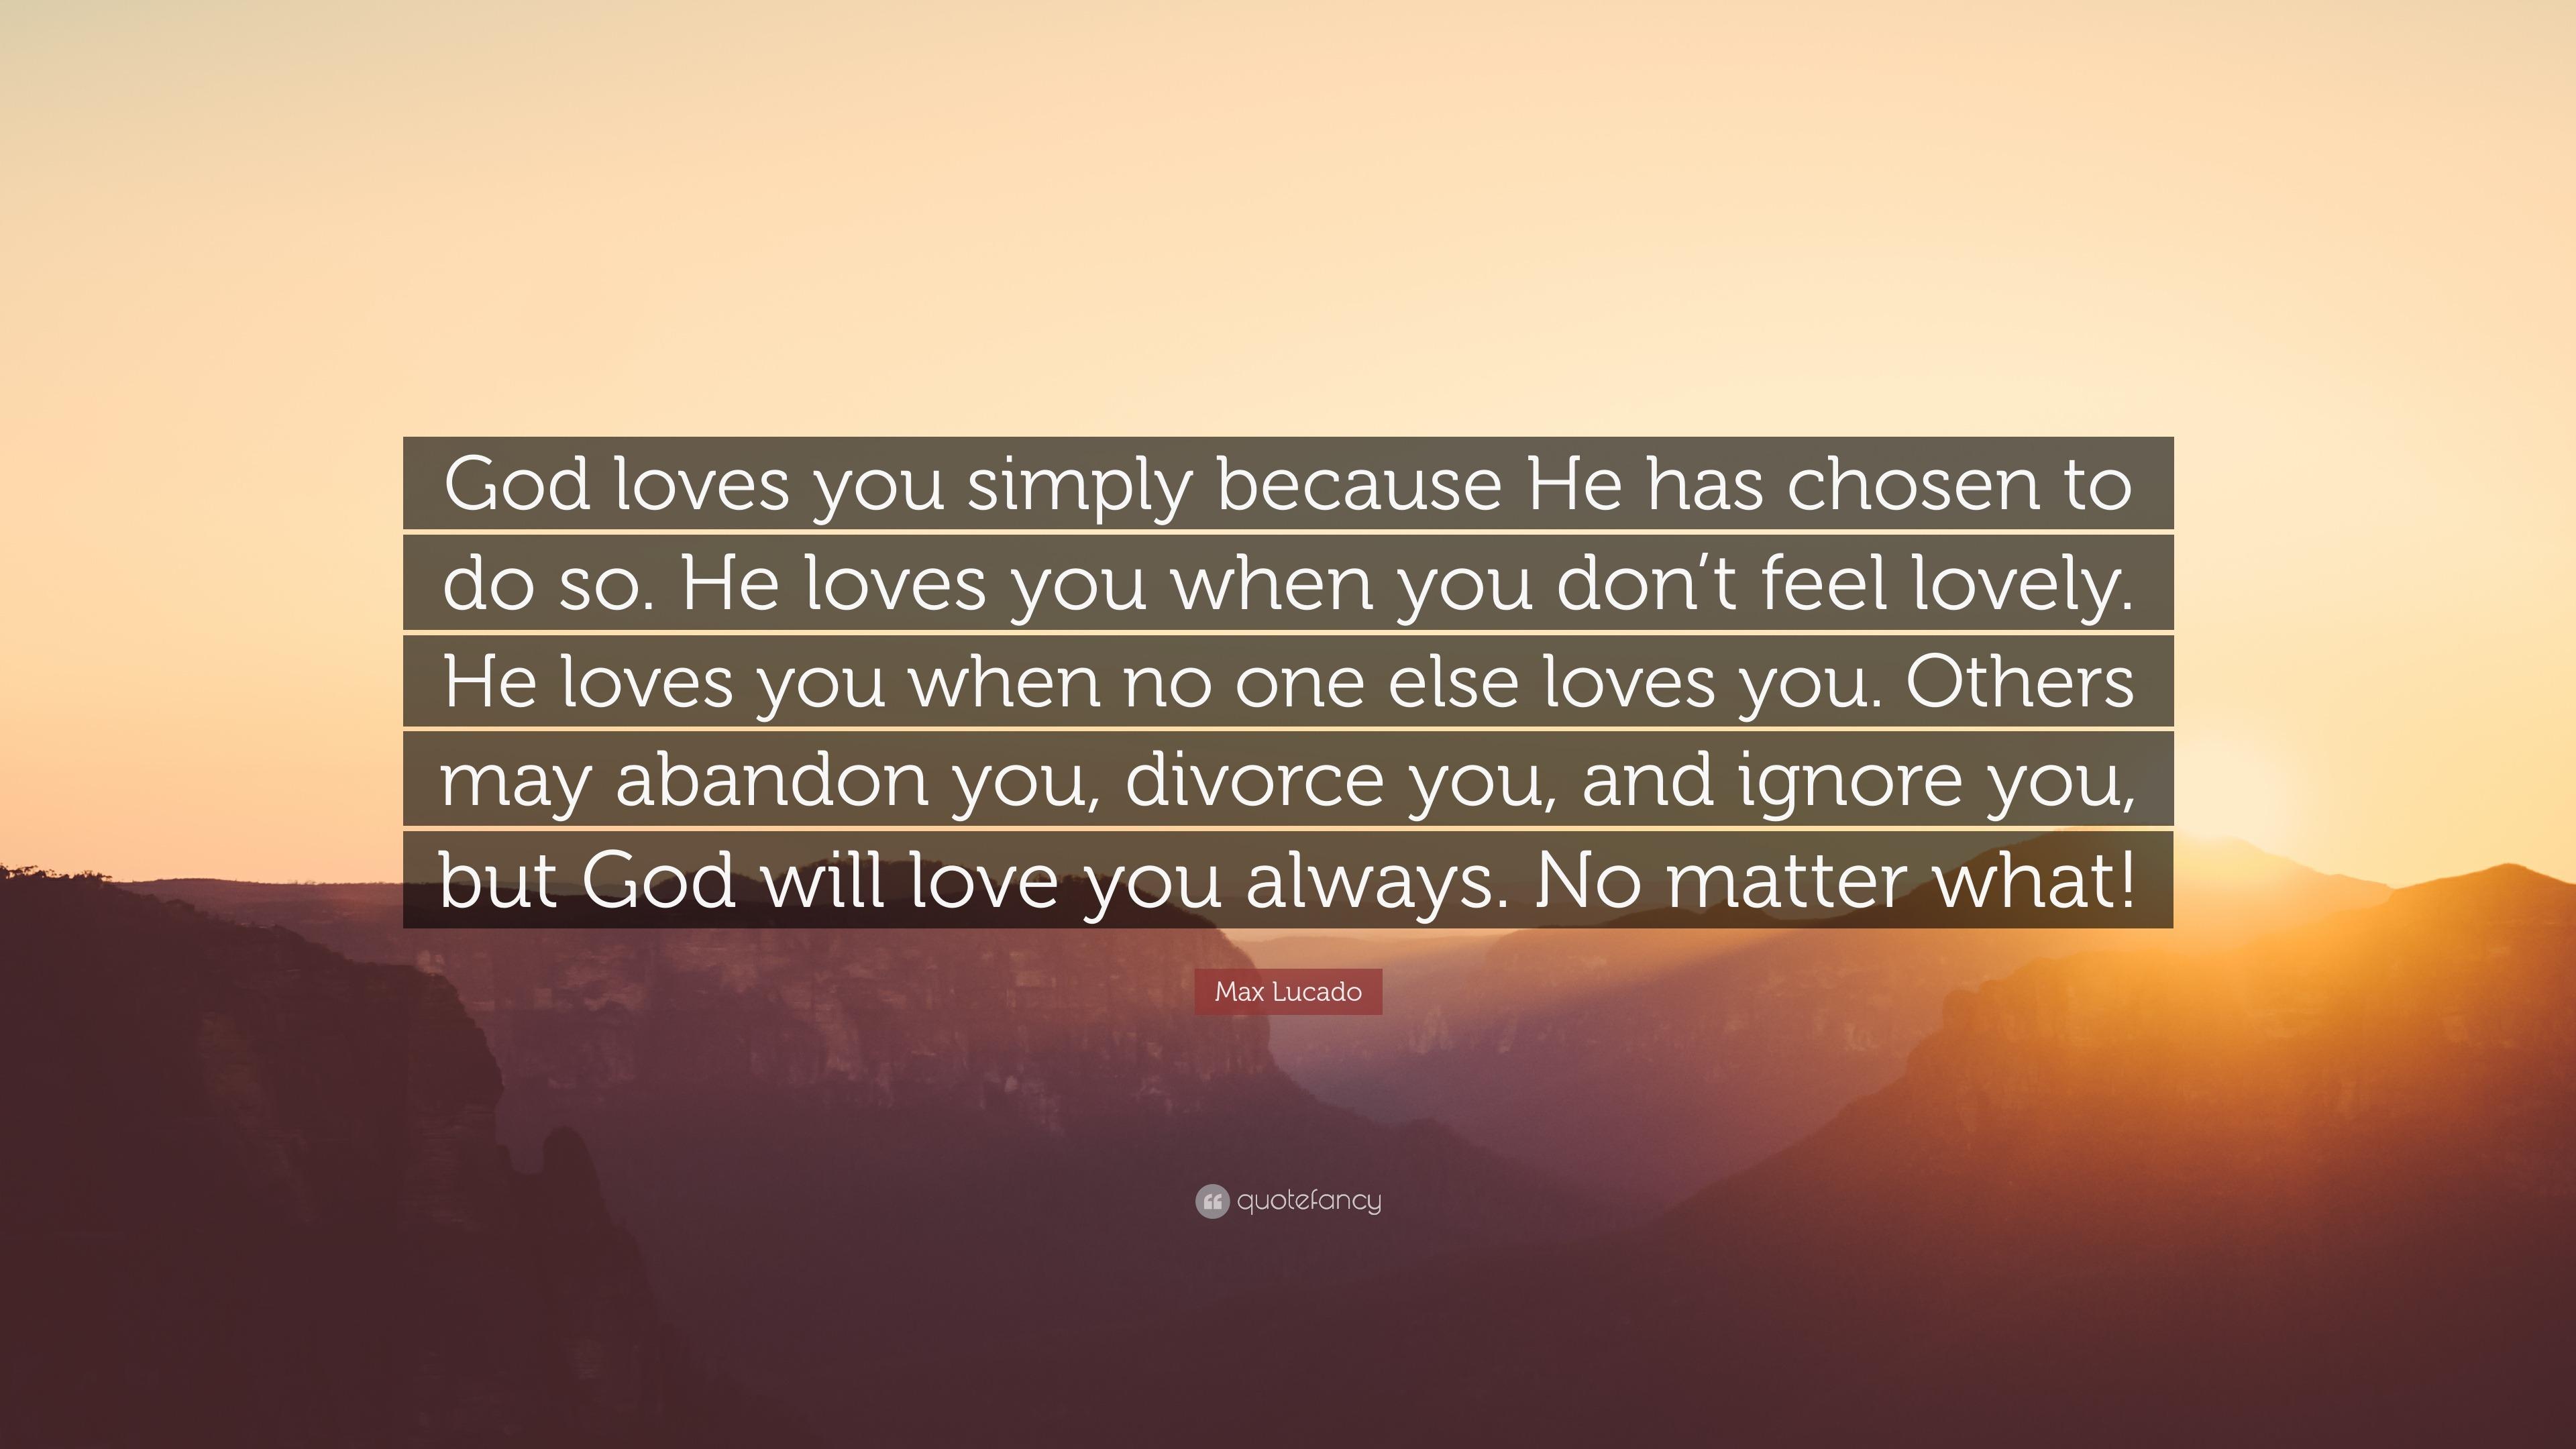 Max lucado quote god loves you simply because he has chosen to do so